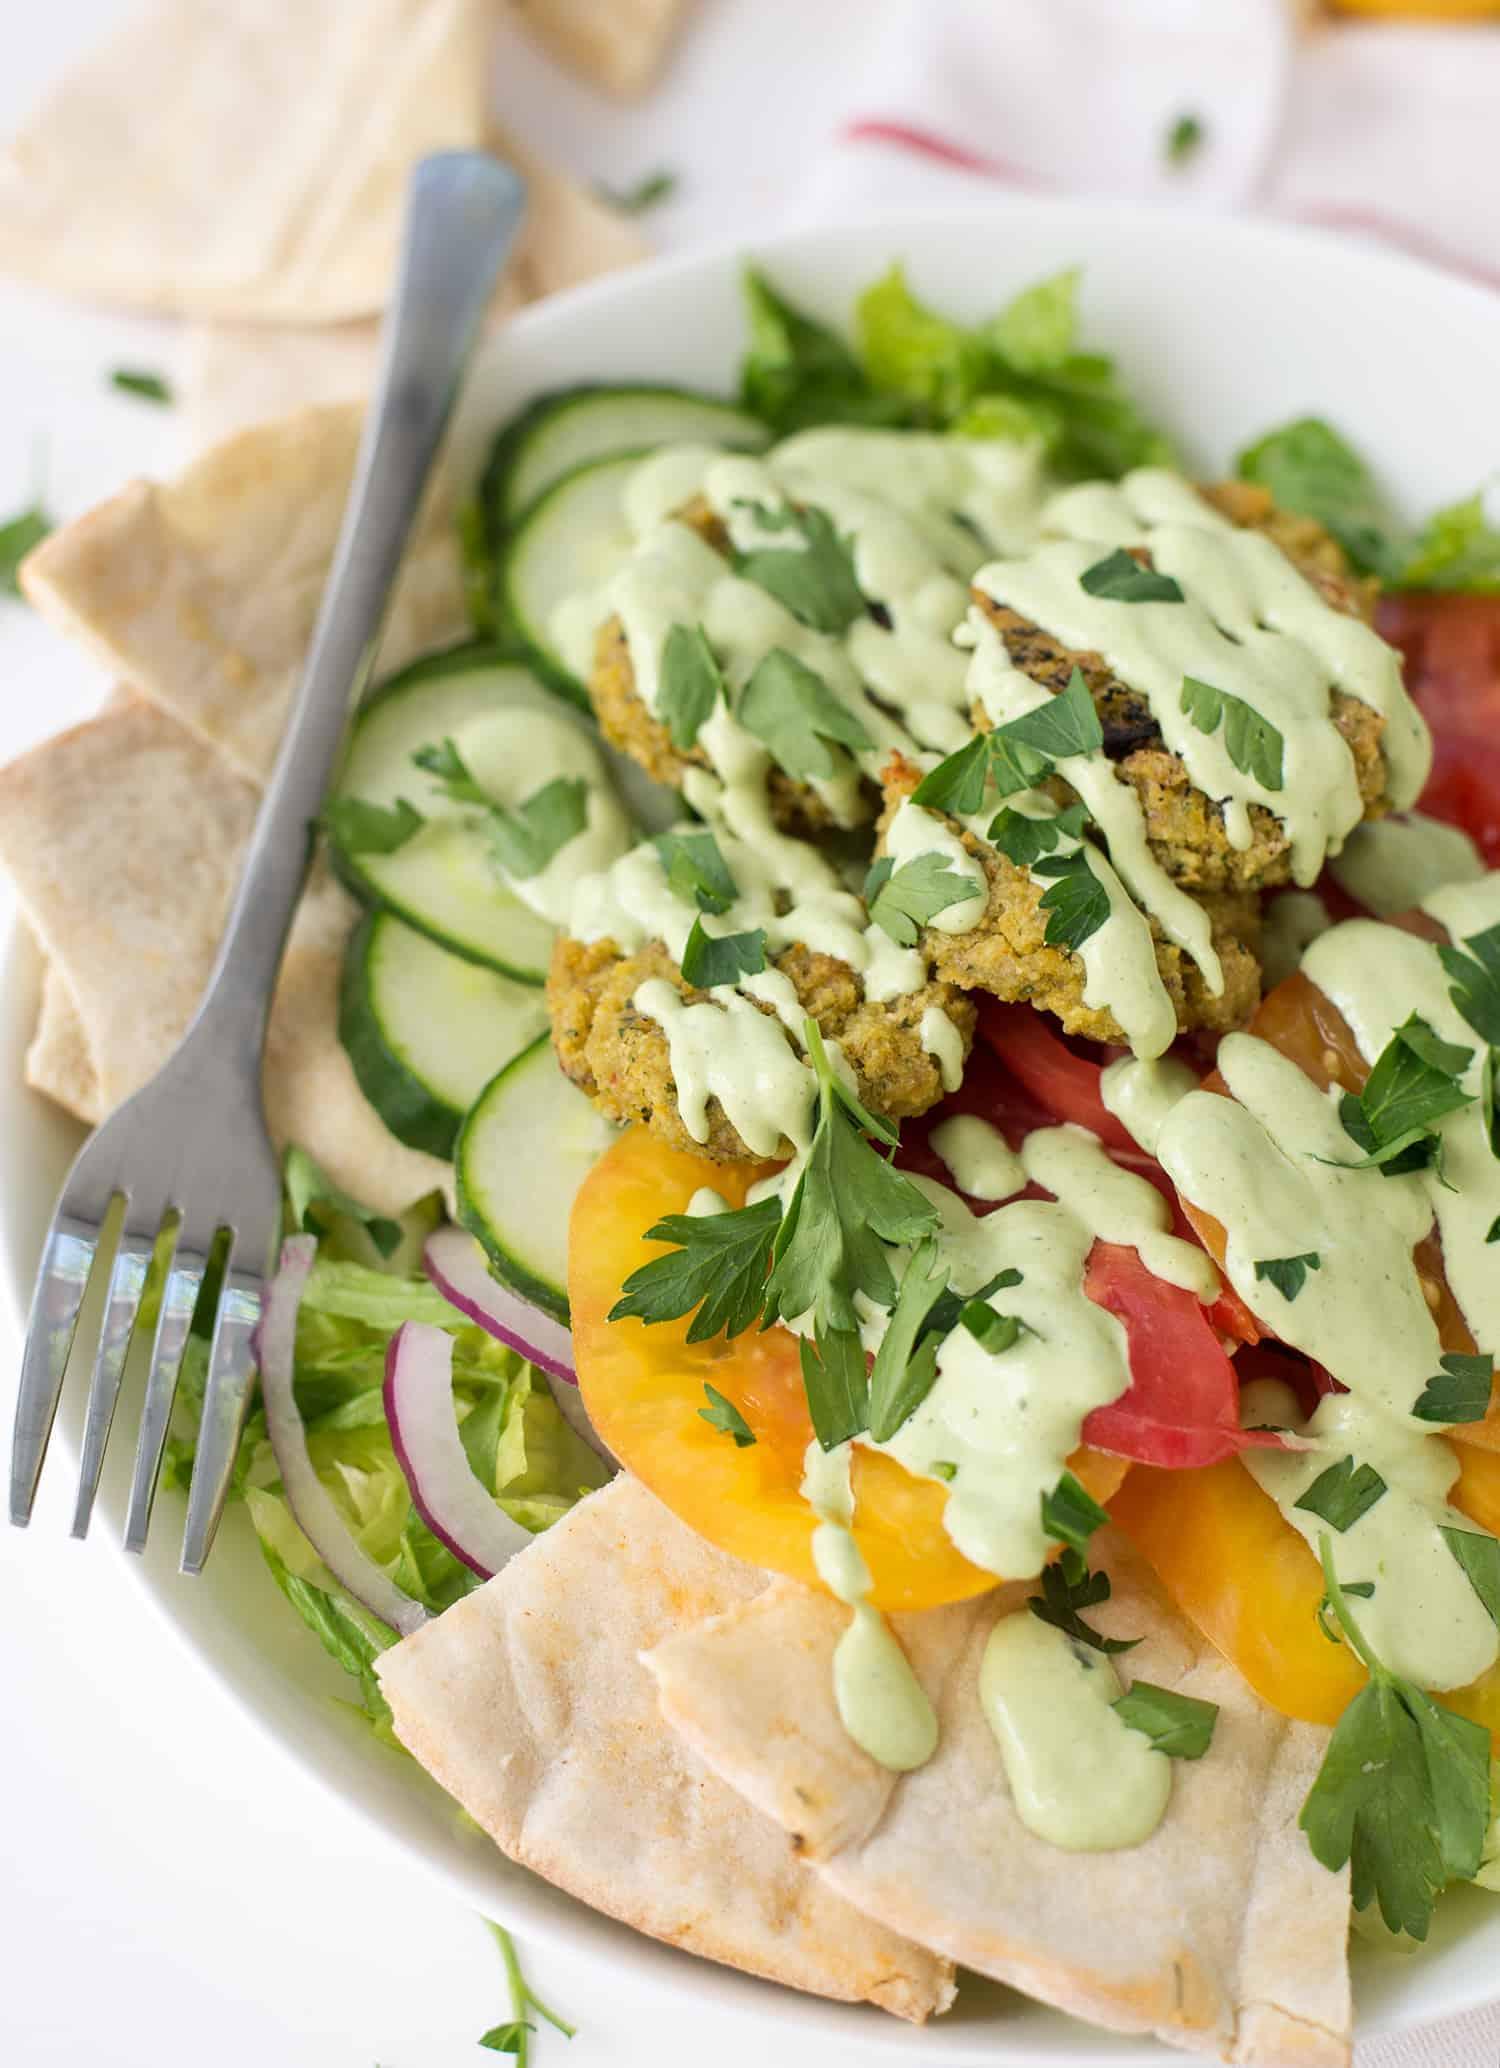 Falafel Salad with Tahini Parsley dressing! Crispy vegan falafel patties on top of salad with tahini parsley dressing.   www.delishknowledge.com